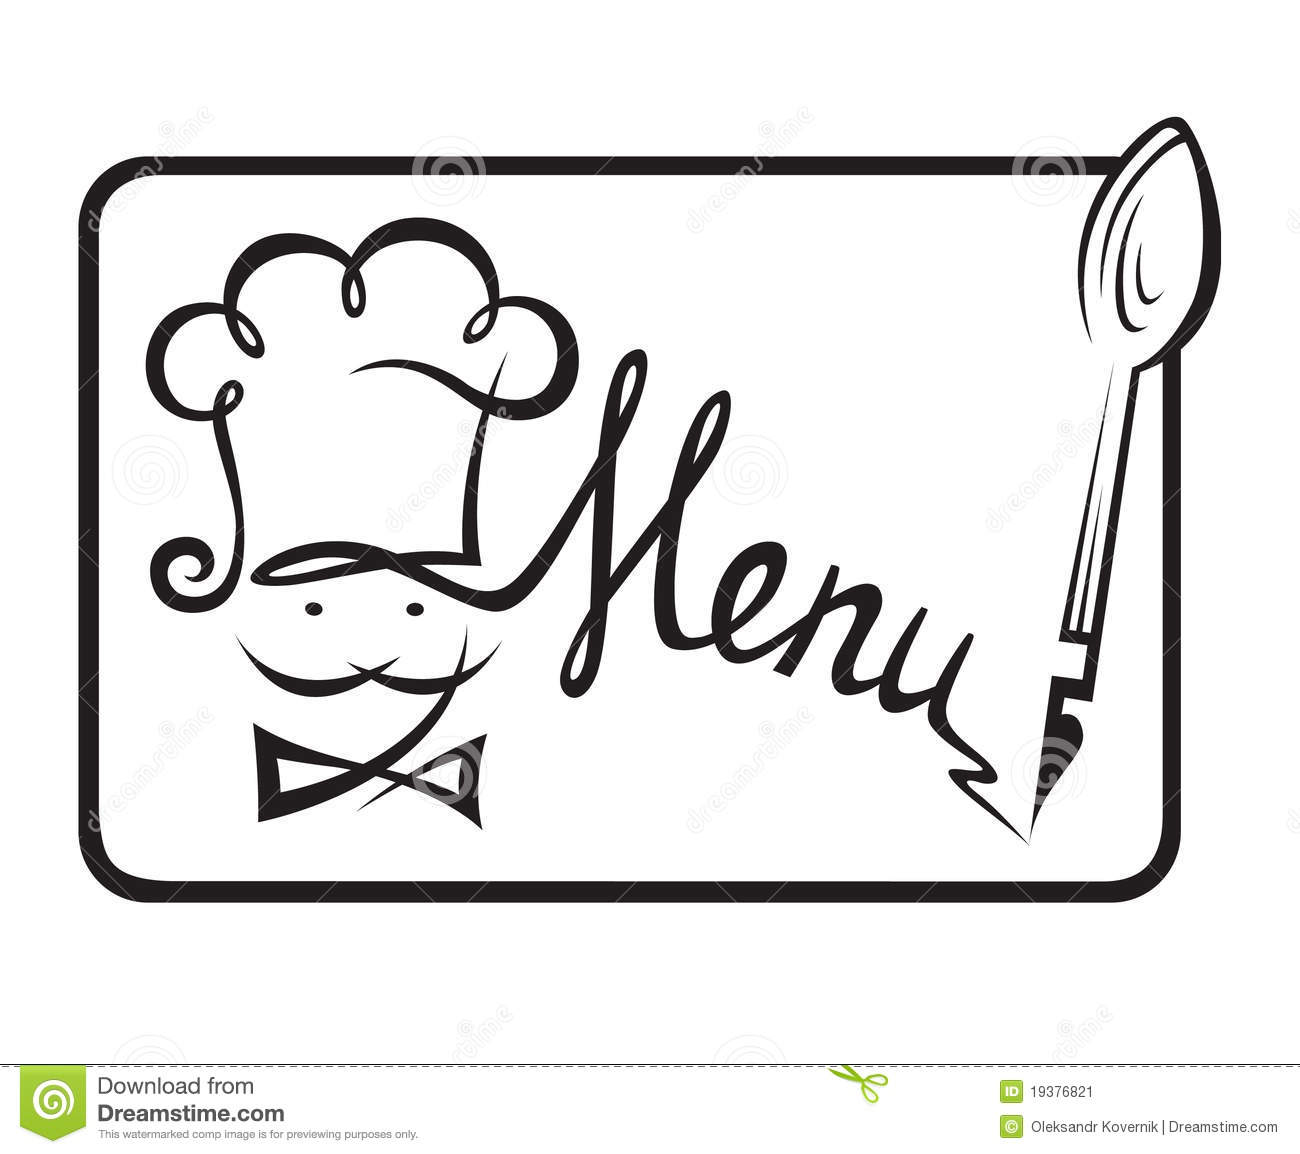 restaurant menu clipart - photo #33